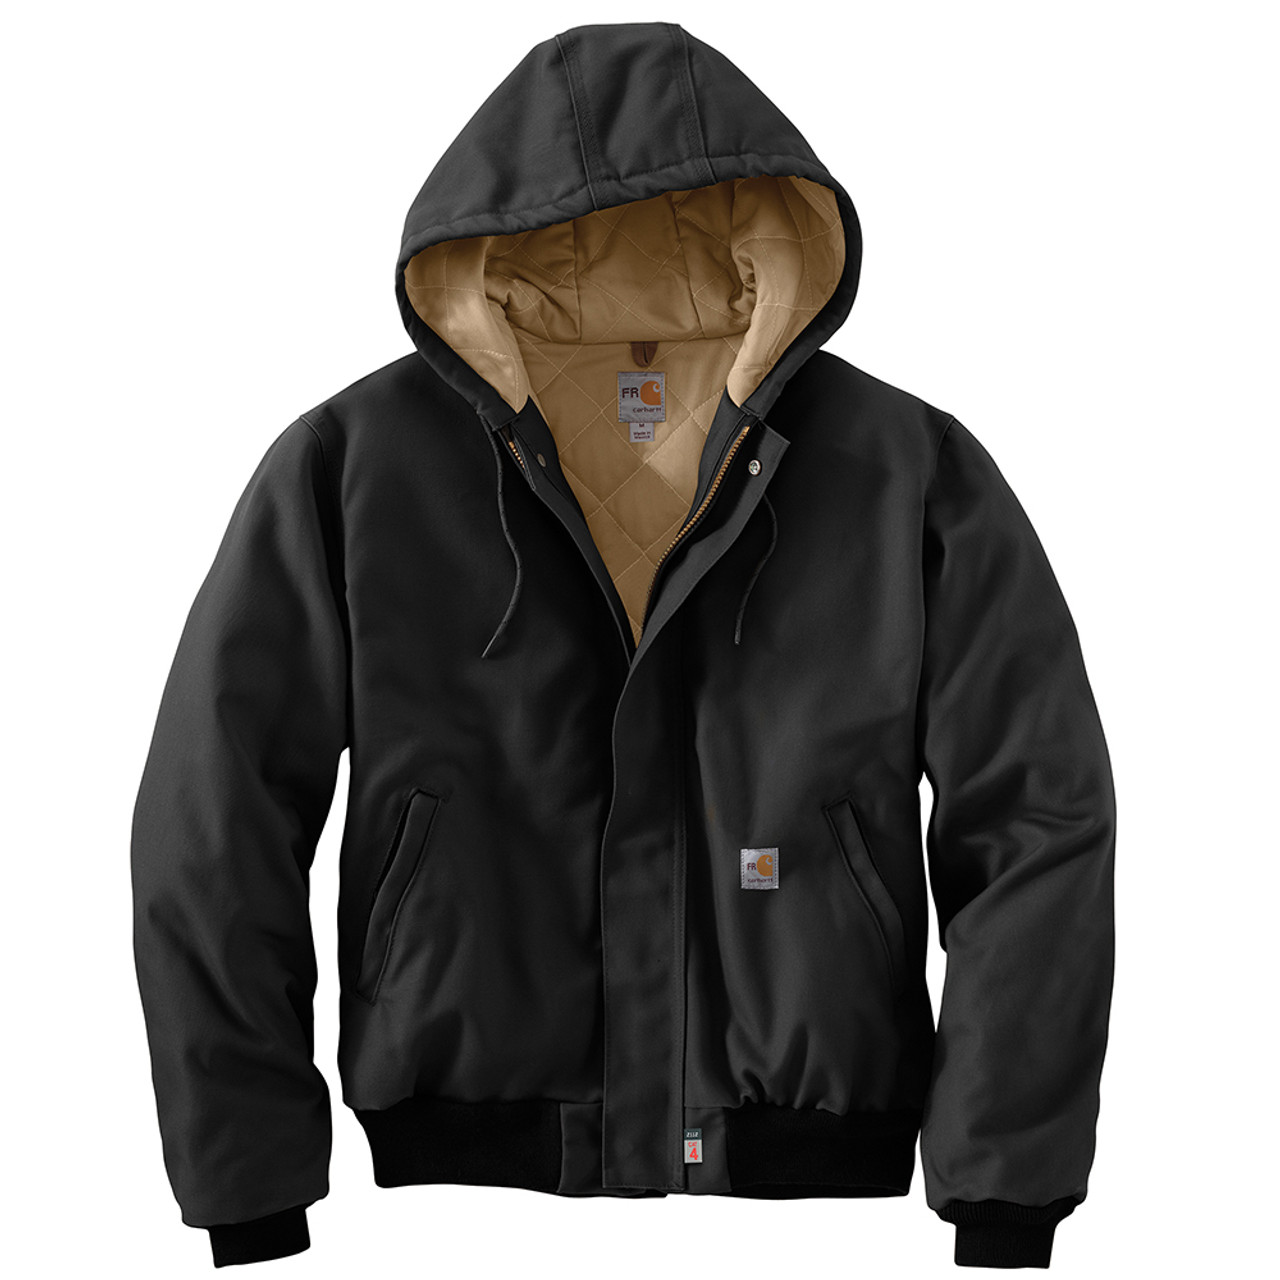 6d01d9d965 Carhartt 54 cal/cm2 Men's Flame Resistant Duck Active Jacket ...